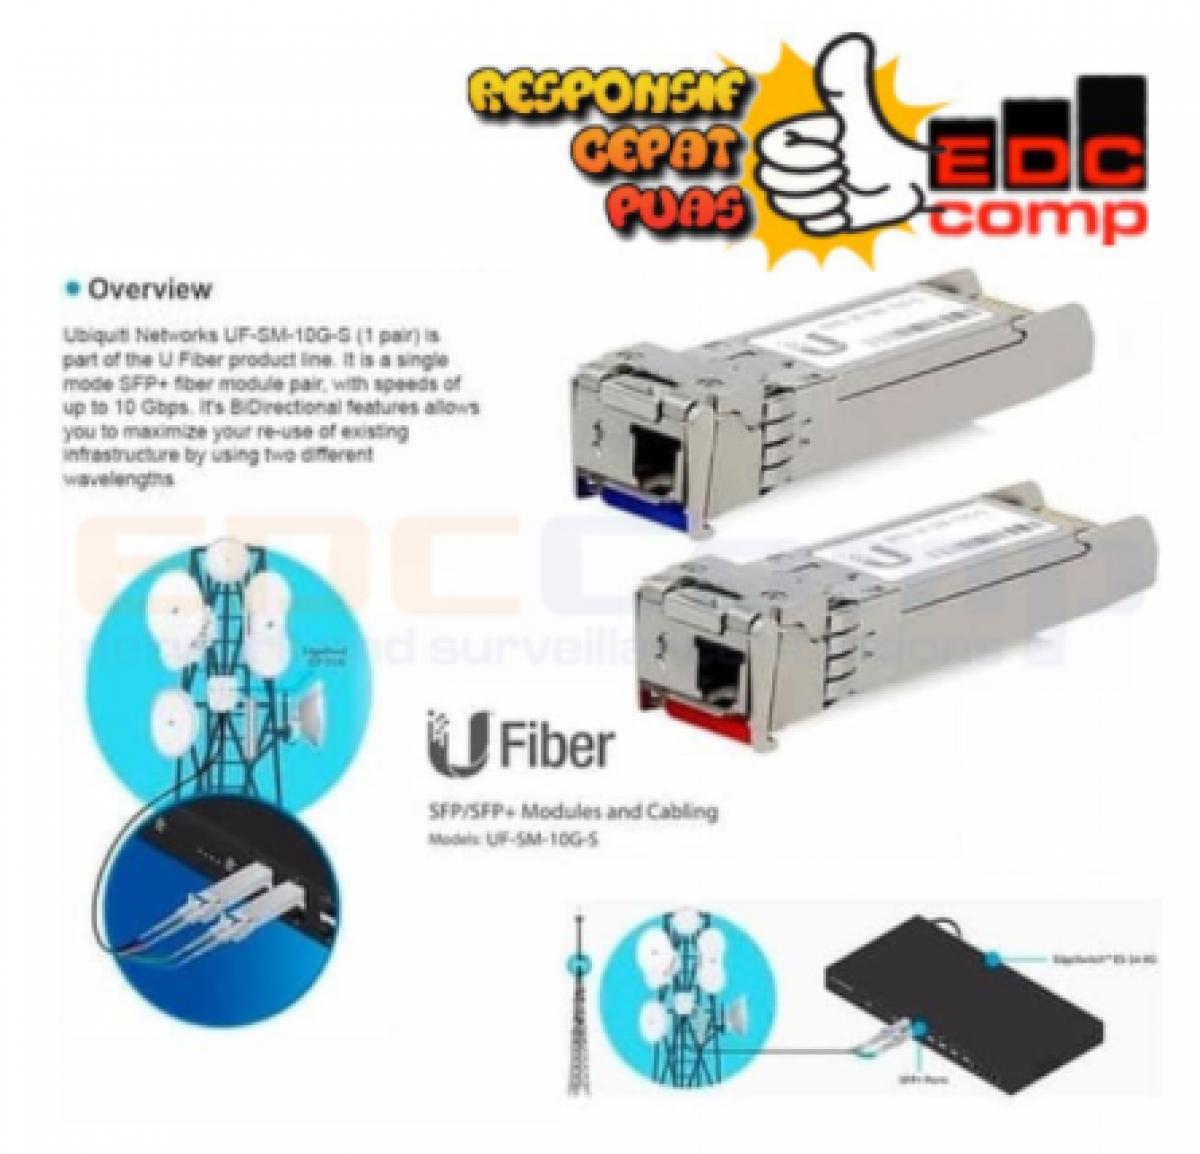 UBIQUITI UF-SM-10G-S Unifi Fiber Single Mode 10G SFP+ Module BiDi - EdcComp